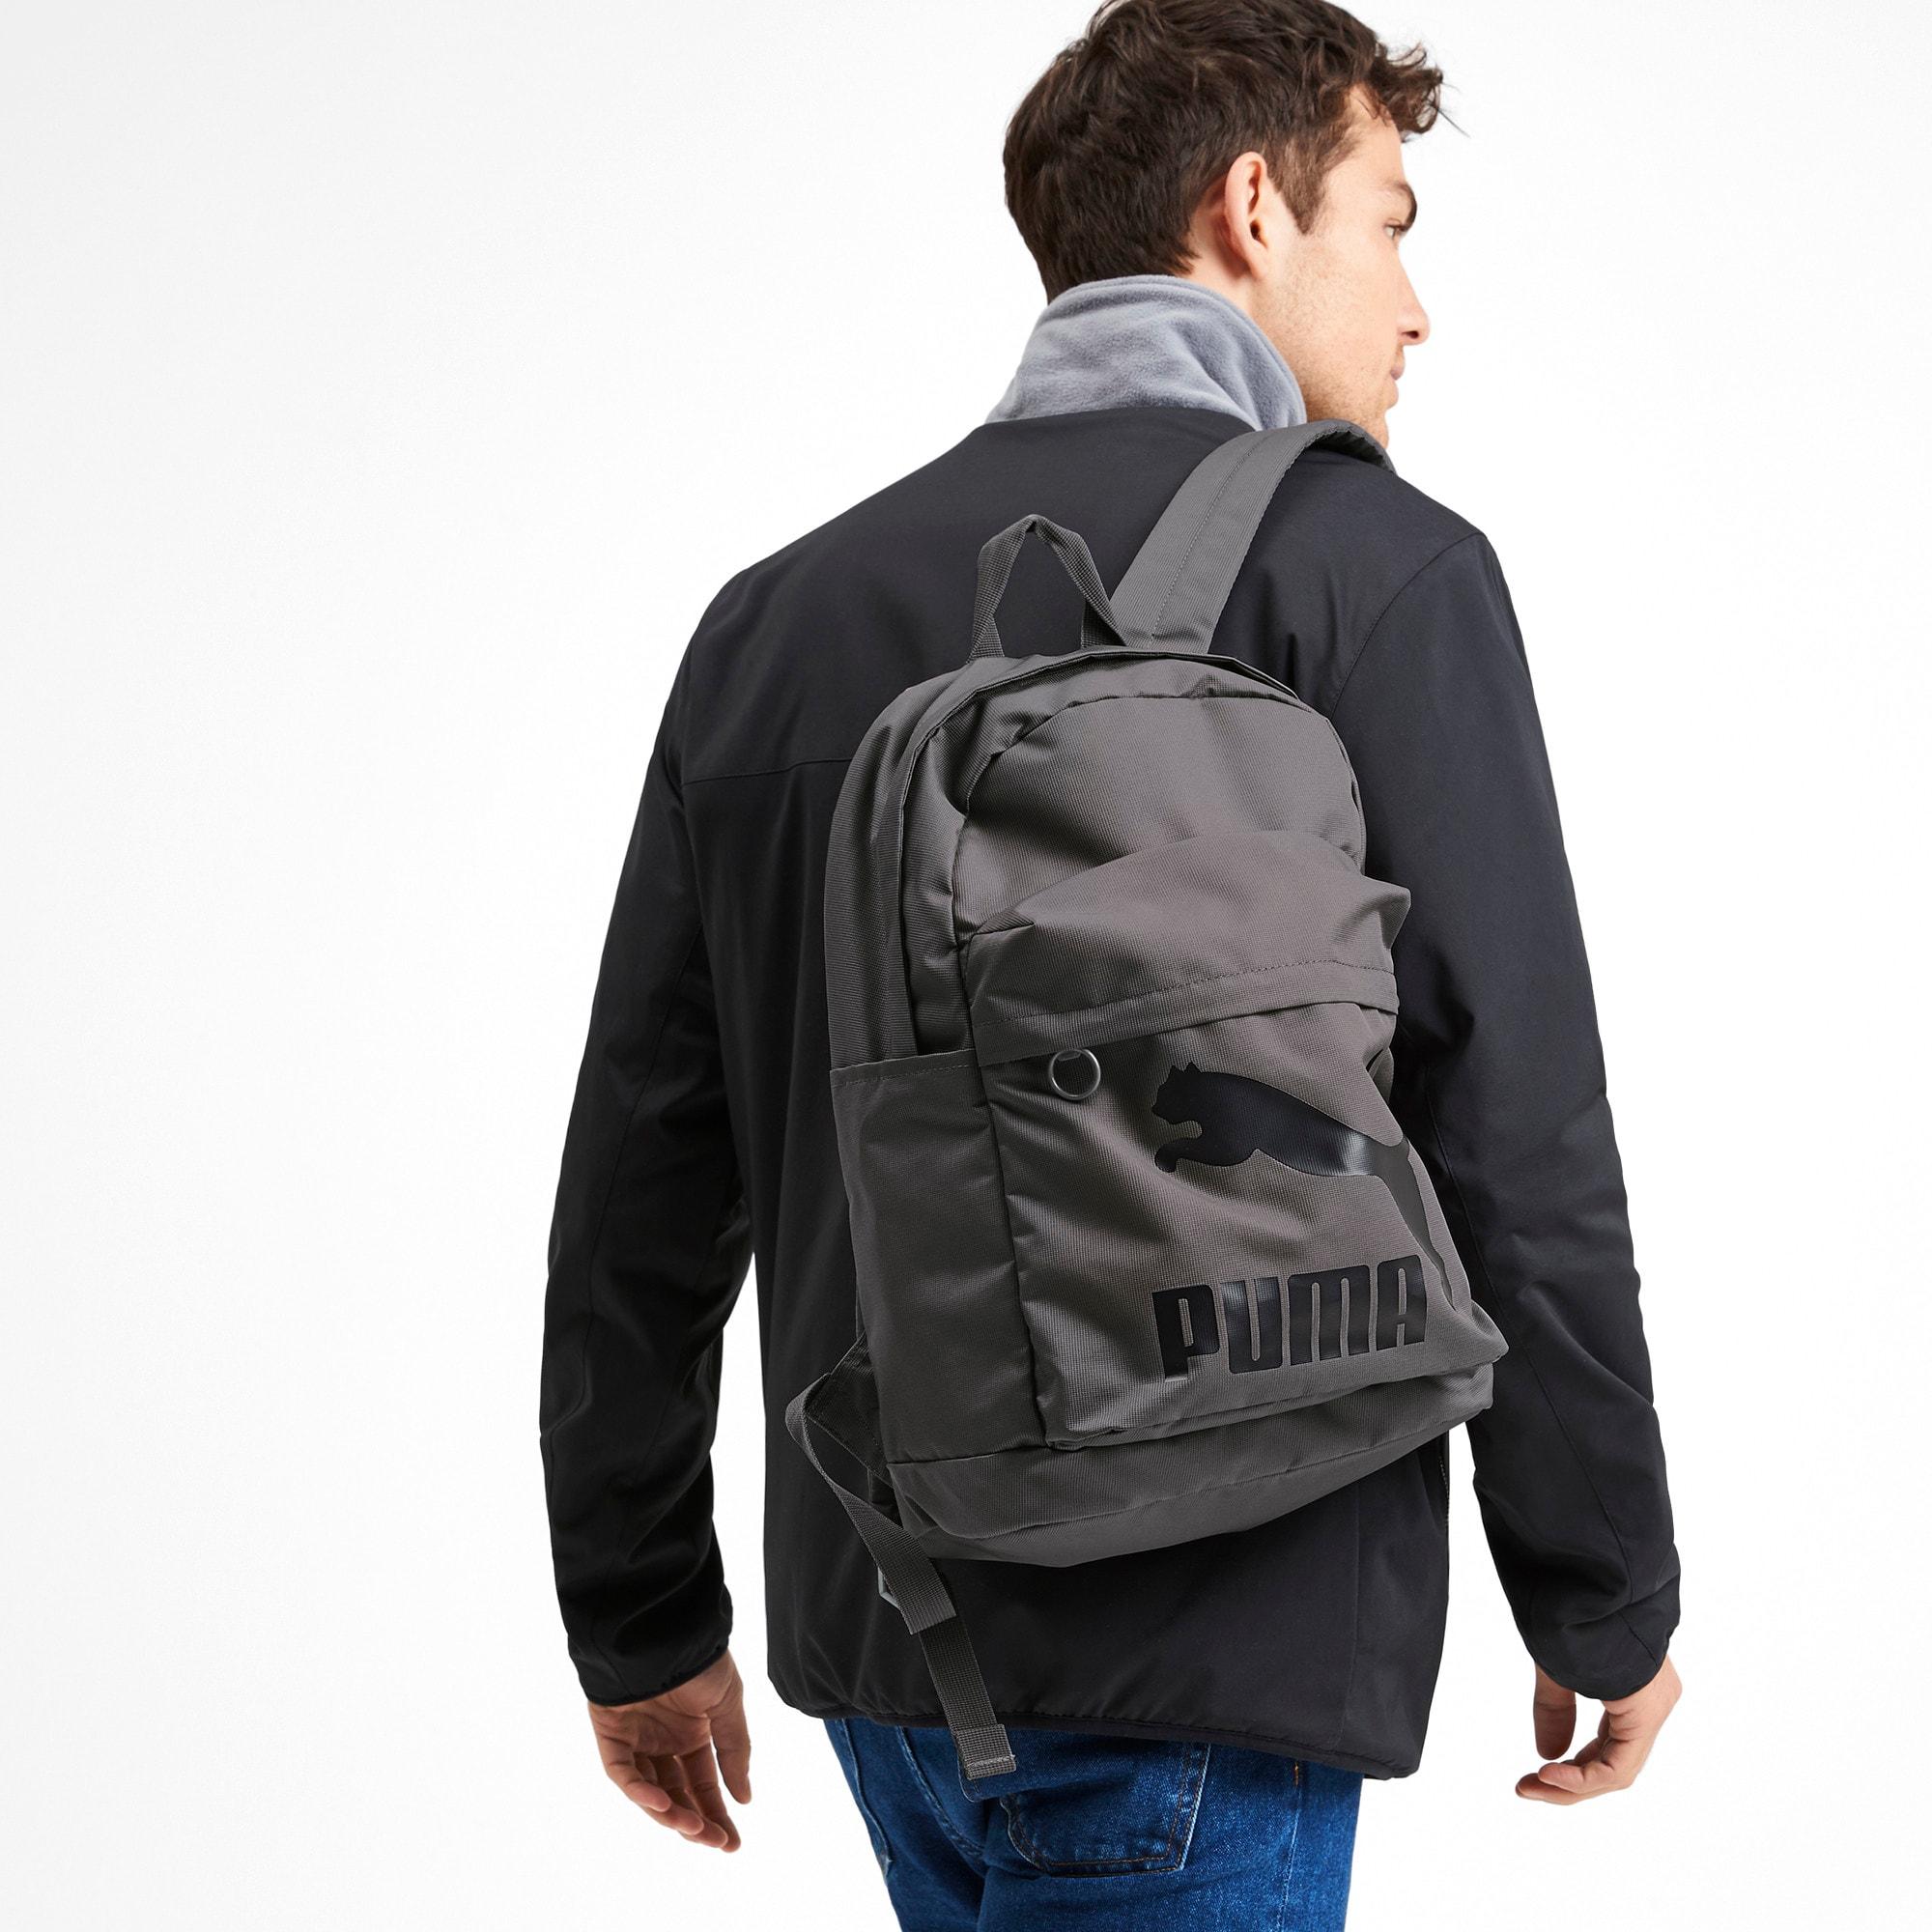 Thumbnail 2 of Originals Backpack, CASTLEROCK, medium